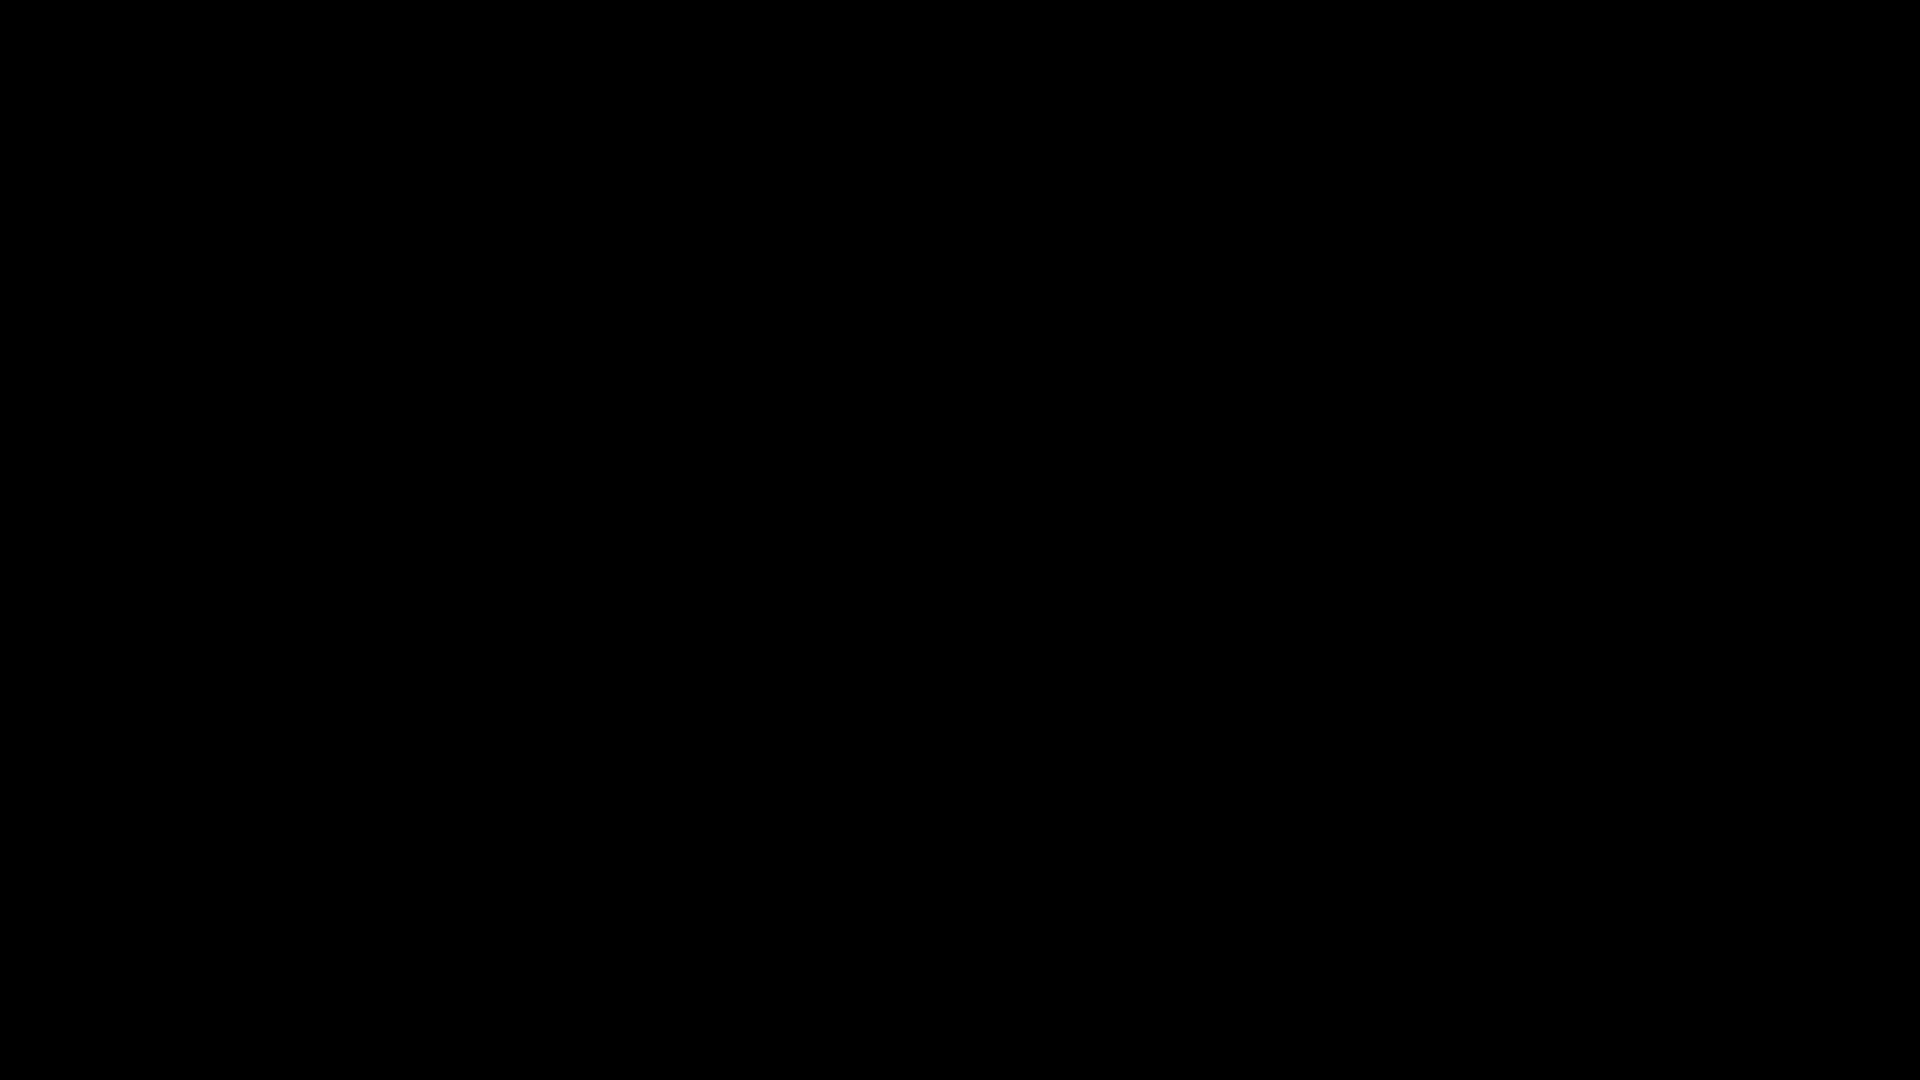 GTA5 Calculated GIFs